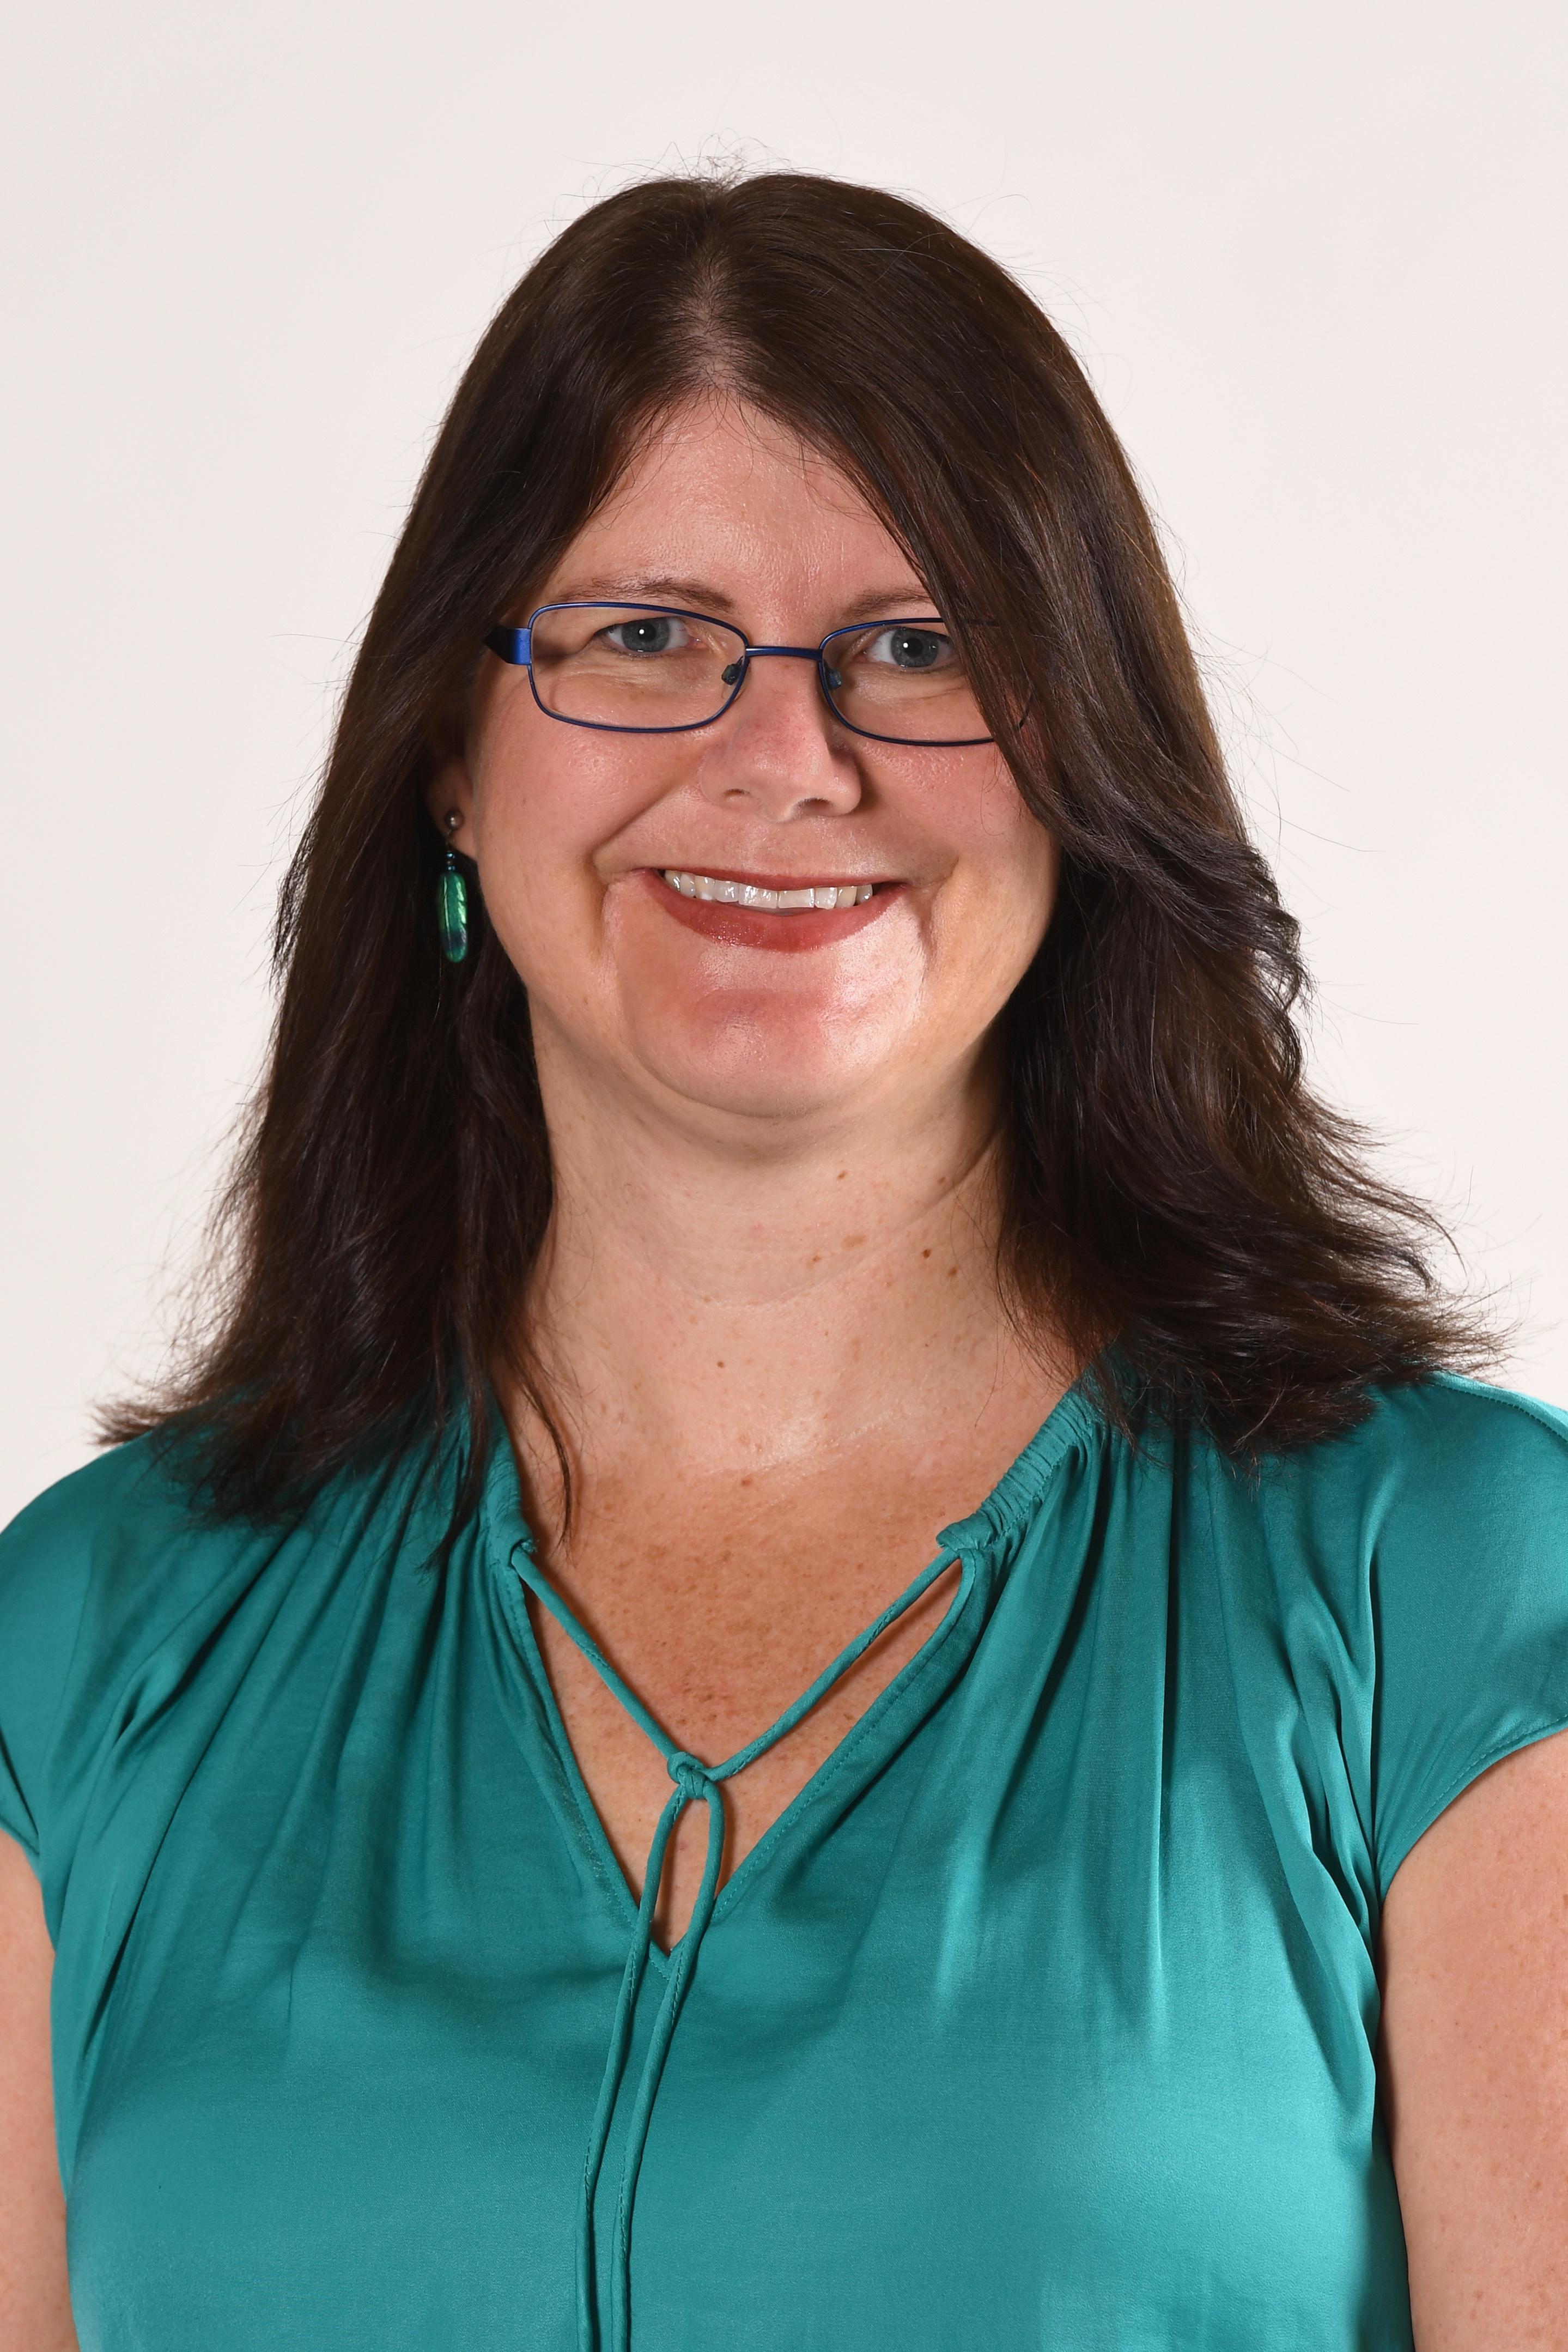 Cathy Buntting